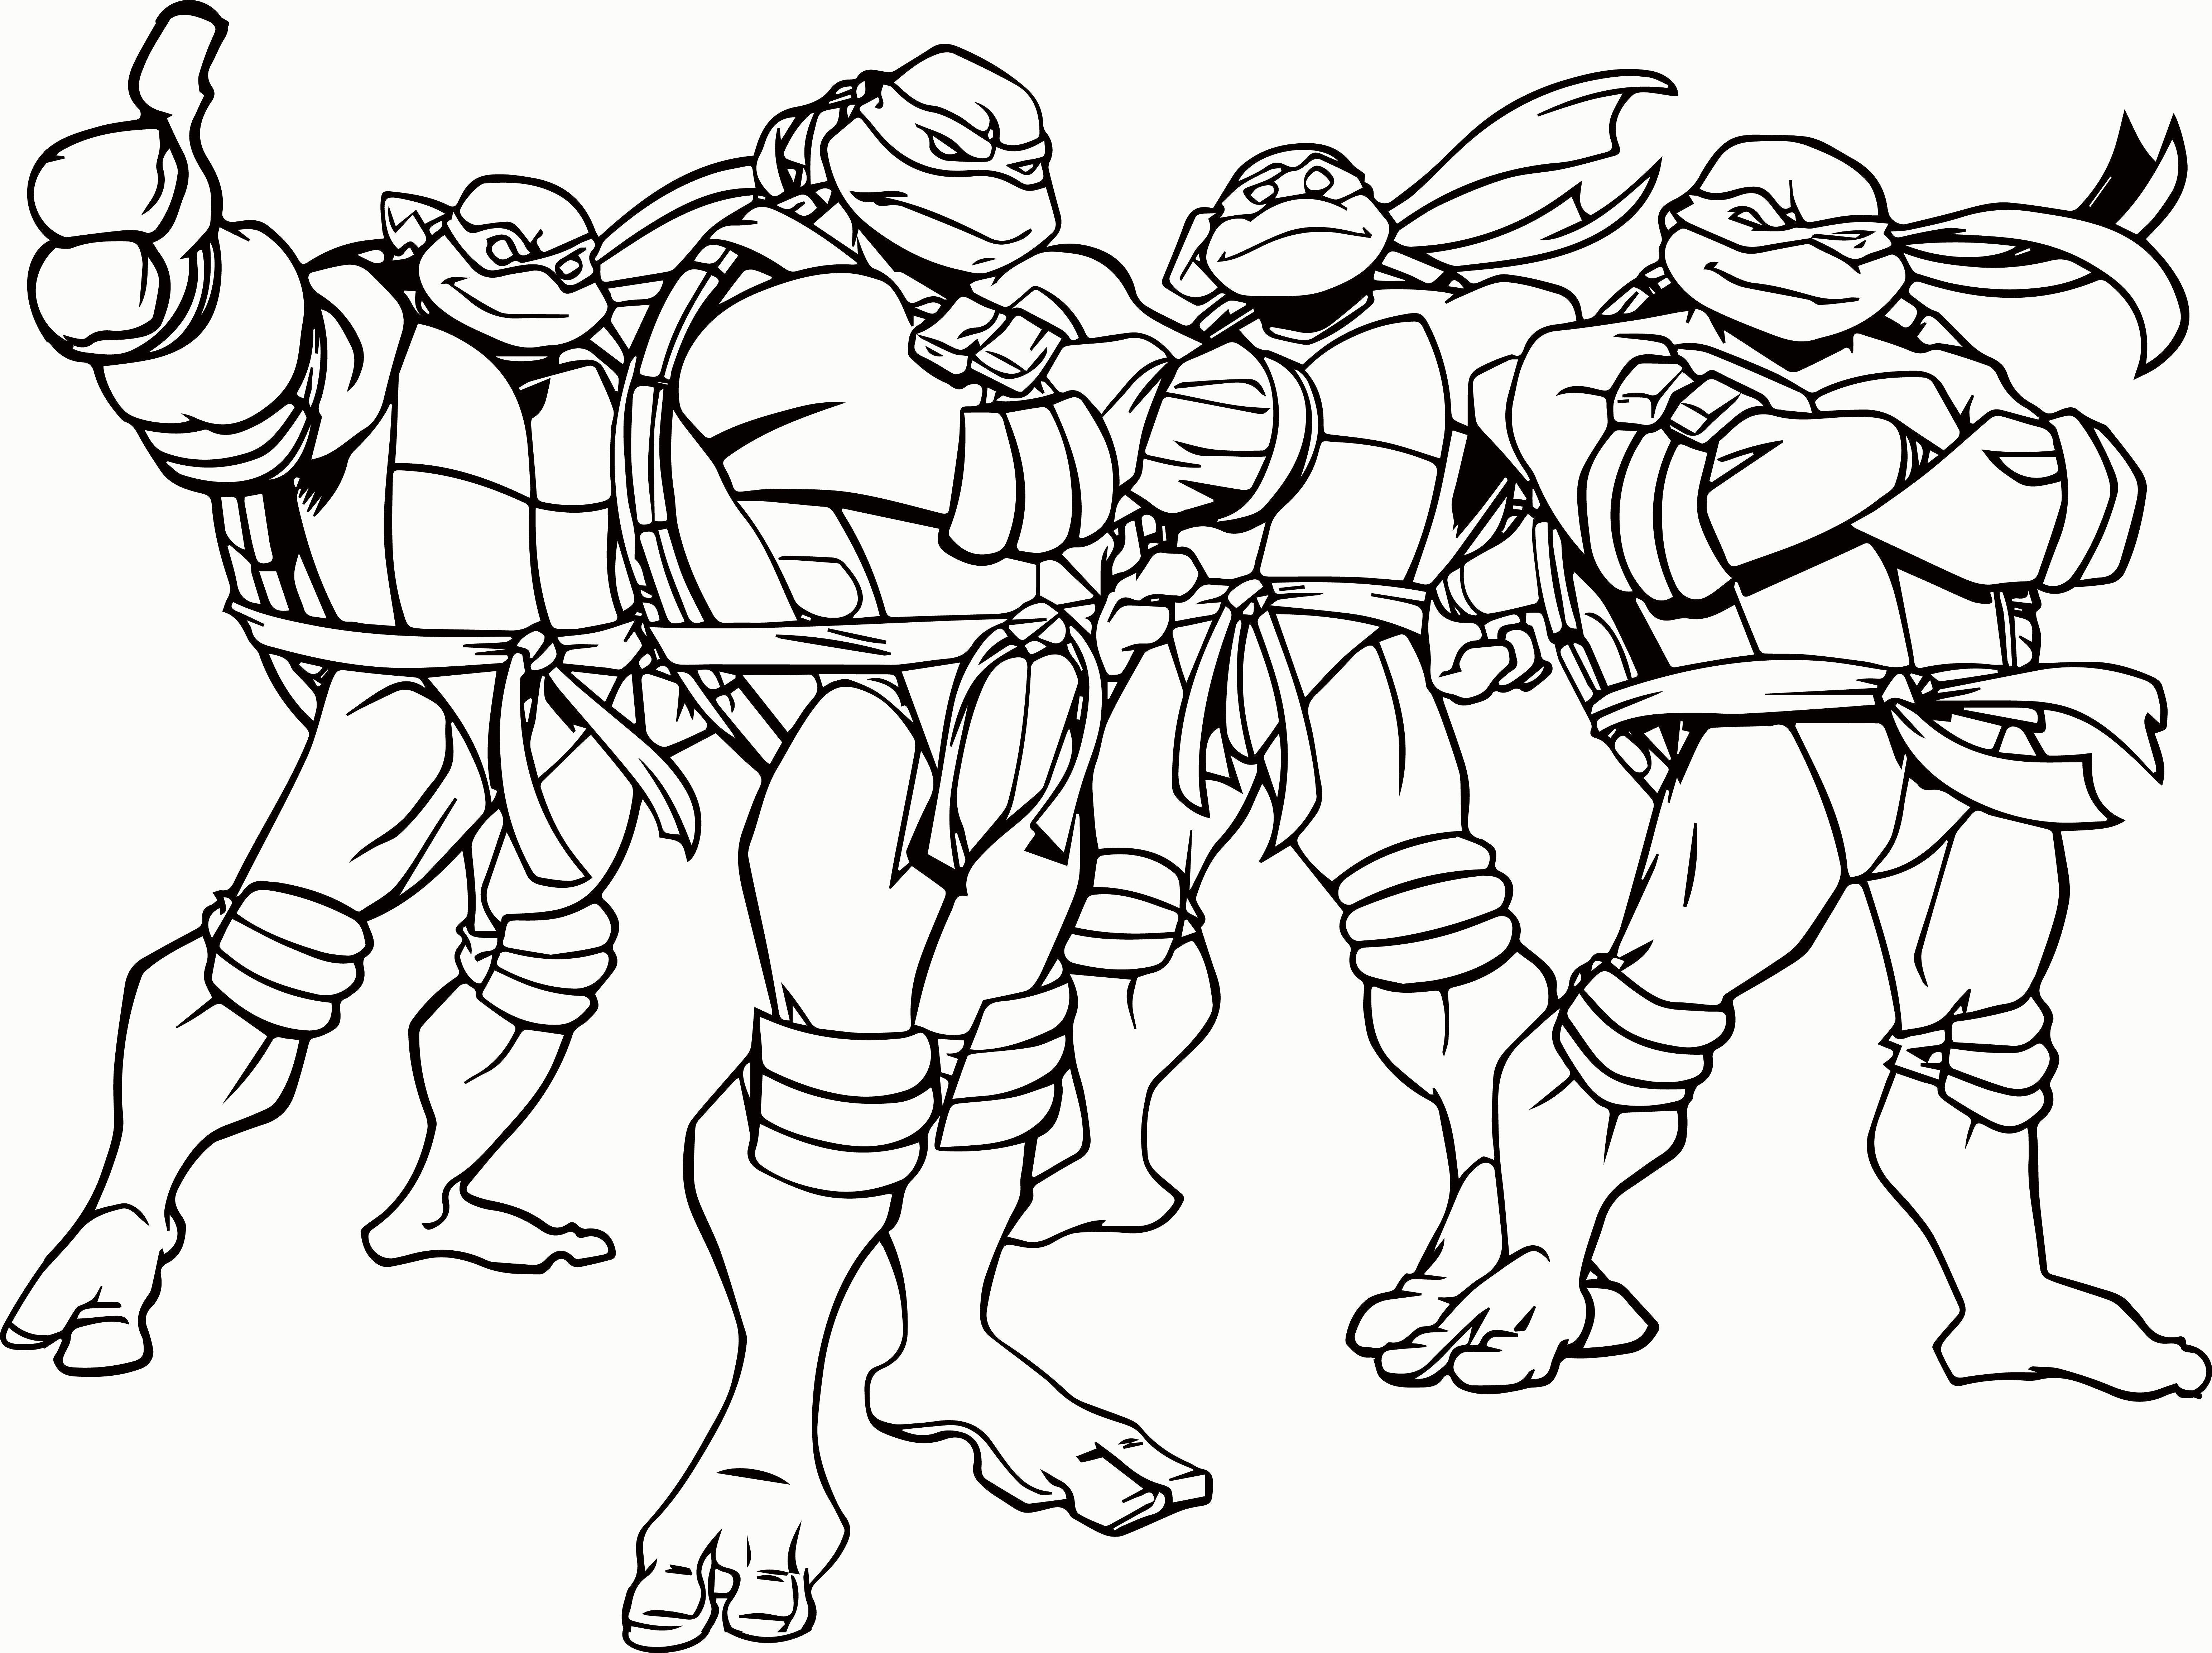 Teenage Mutant Ninja Turtles Coloring Page Lovely